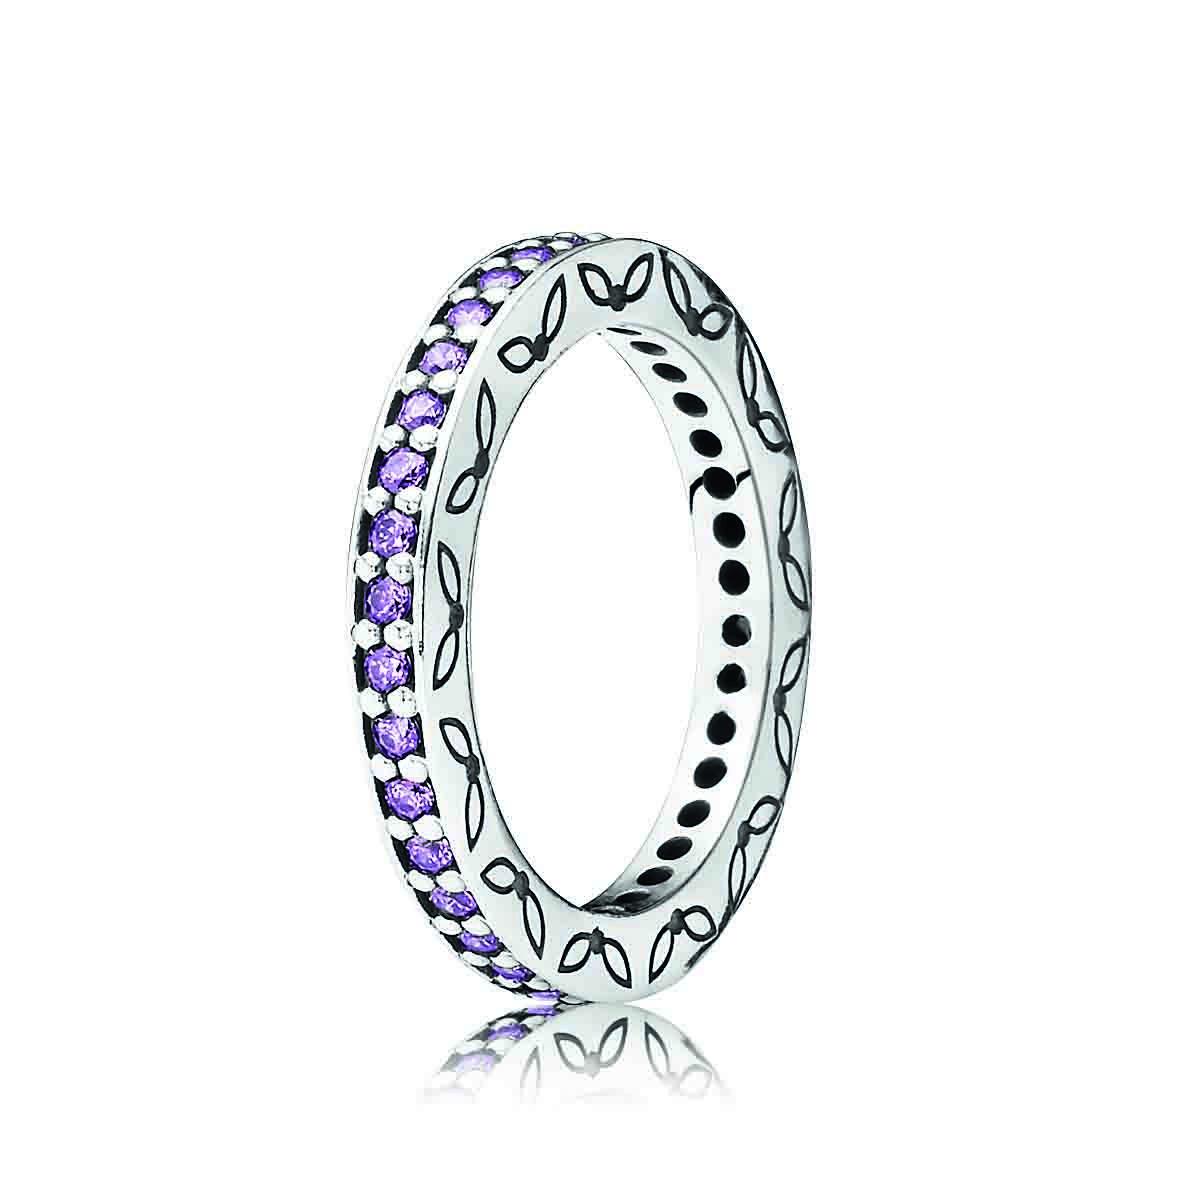 Pandora ring in amethyst  Jewelry  Pinterest